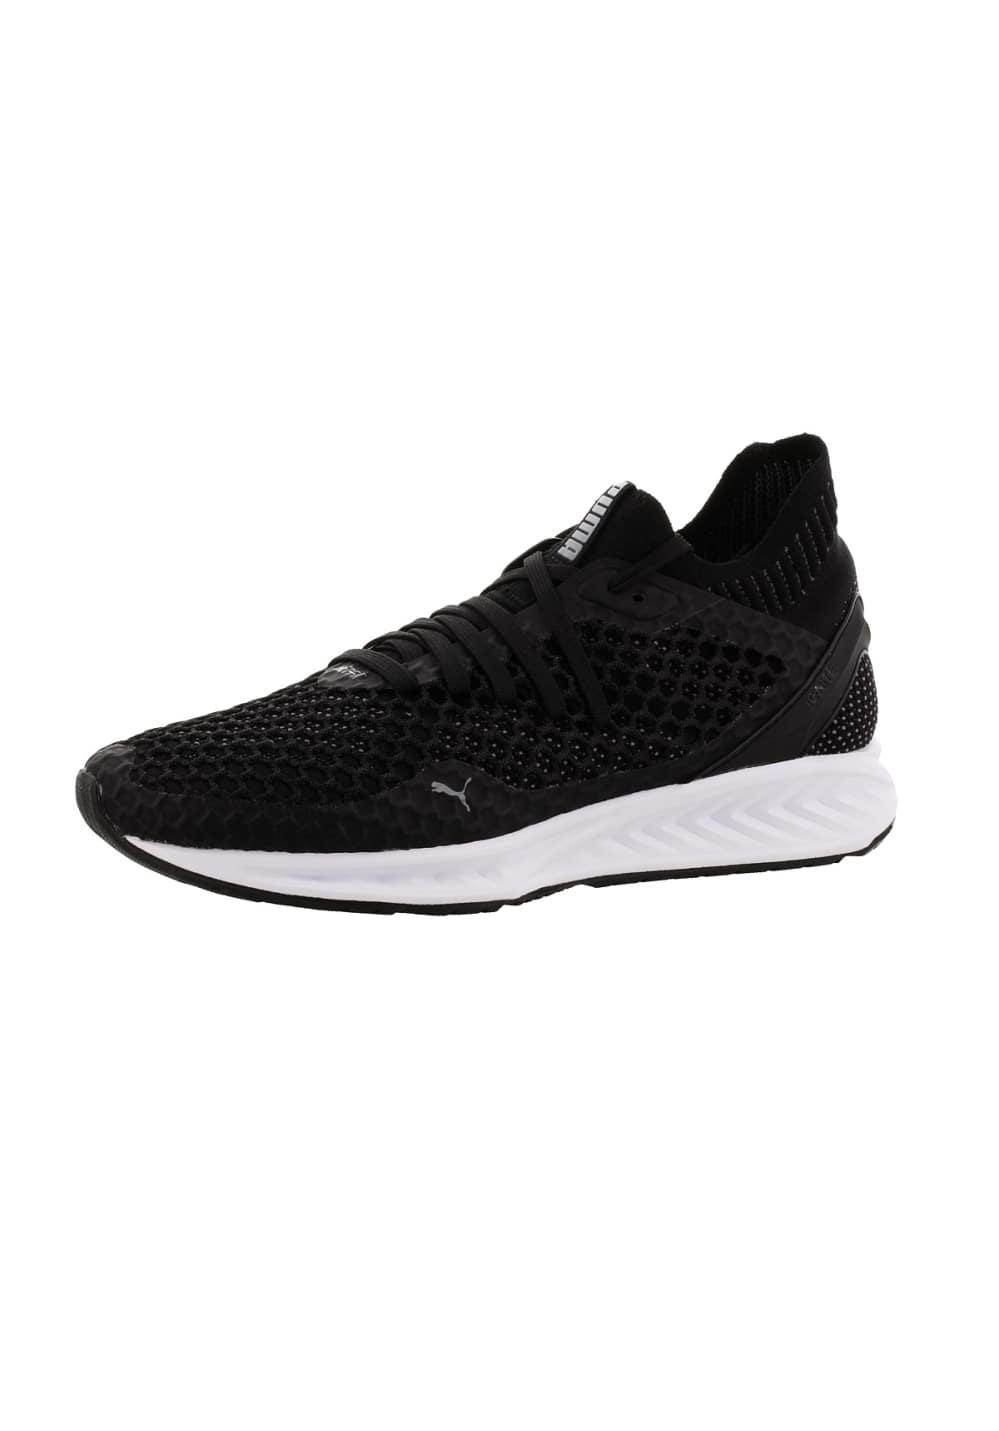 chaussure running homme puma